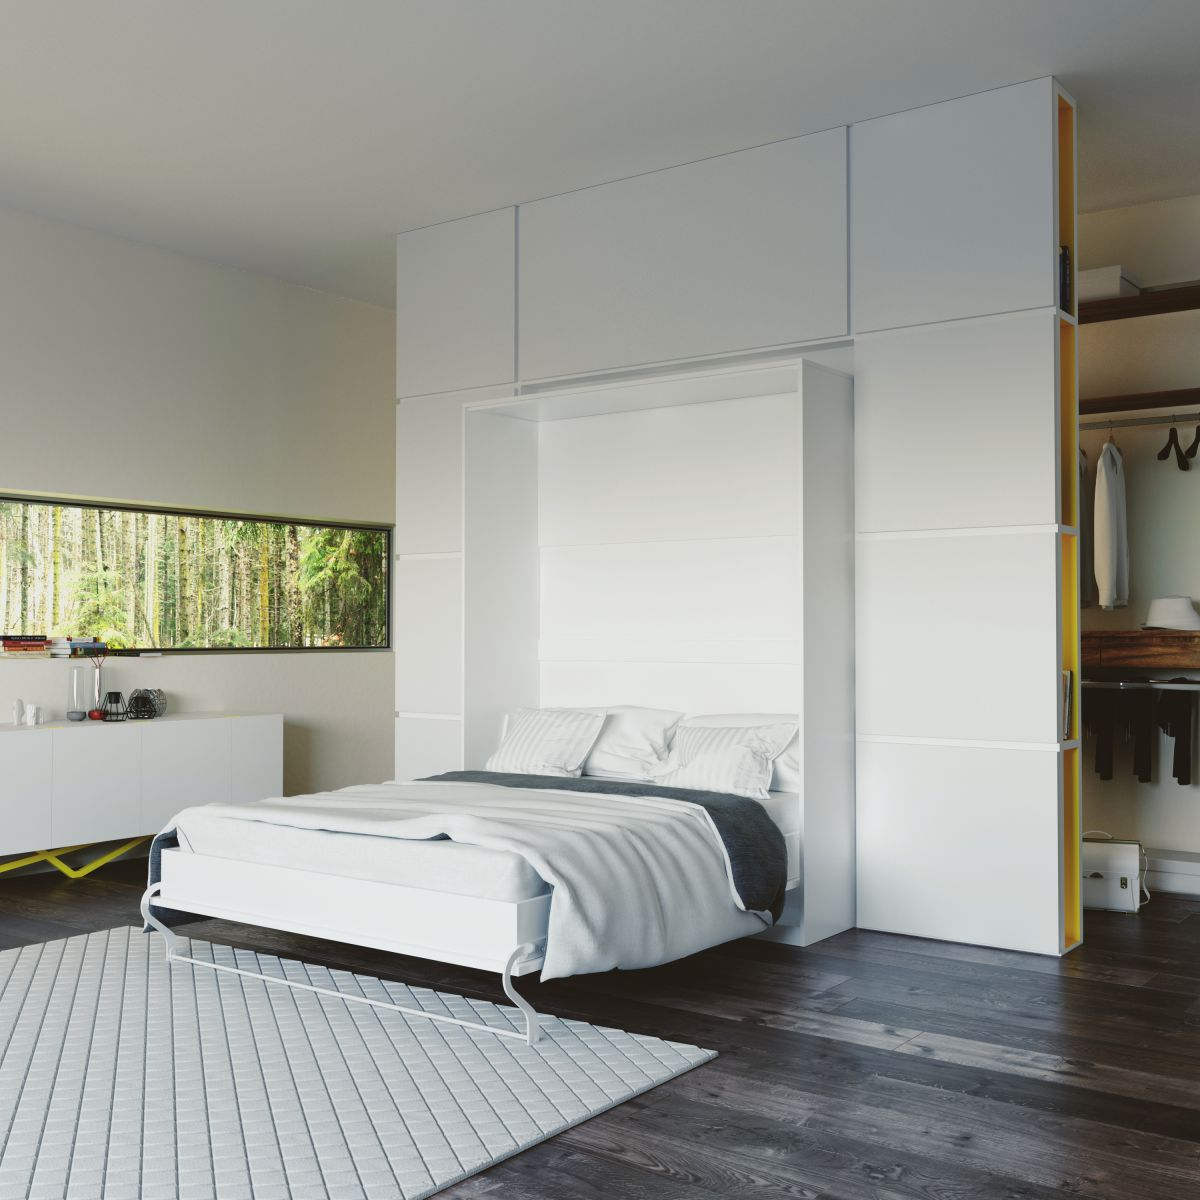 schrankbett 160 cm vertikal gasdruckfeder smartbett bettschrank montage ebay. Black Bedroom Furniture Sets. Home Design Ideas